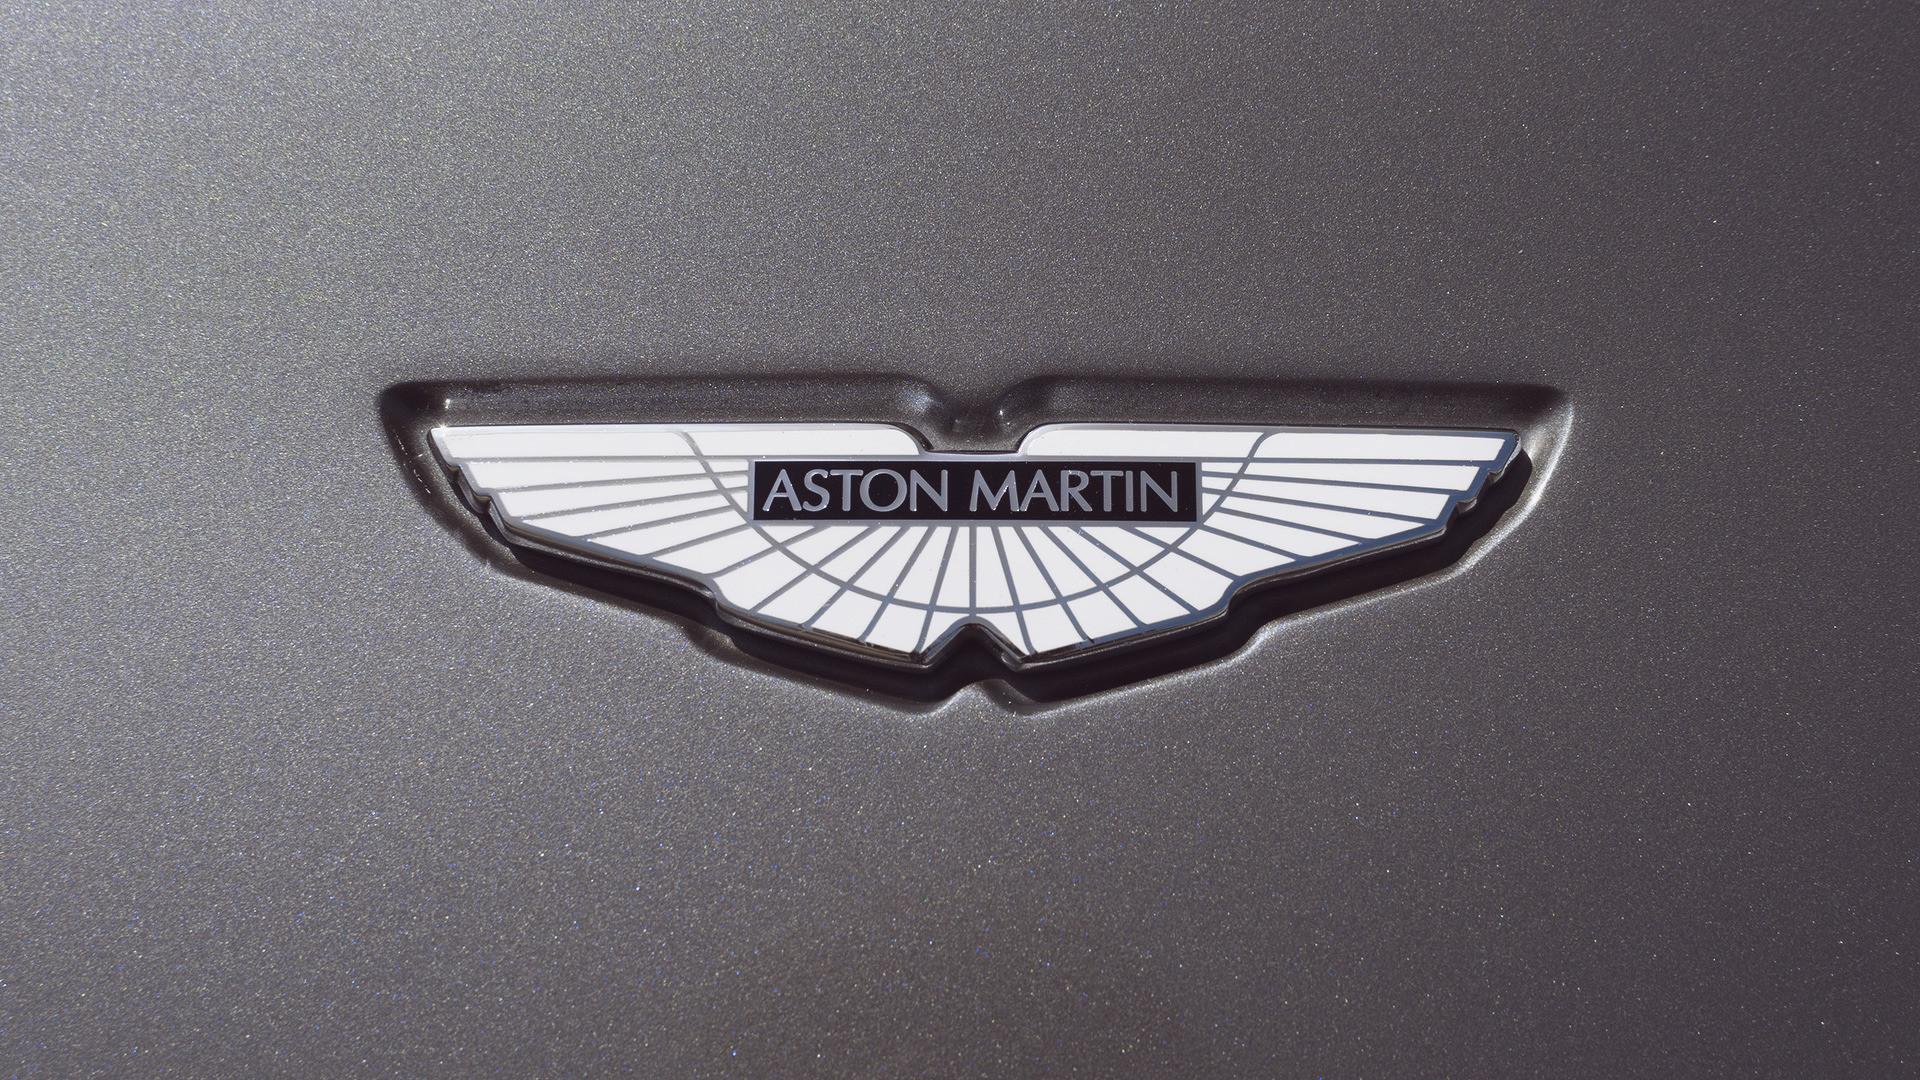 Car Wheel Iphone Wallpaper Aston Martin Logo Wallpapers 55 Images